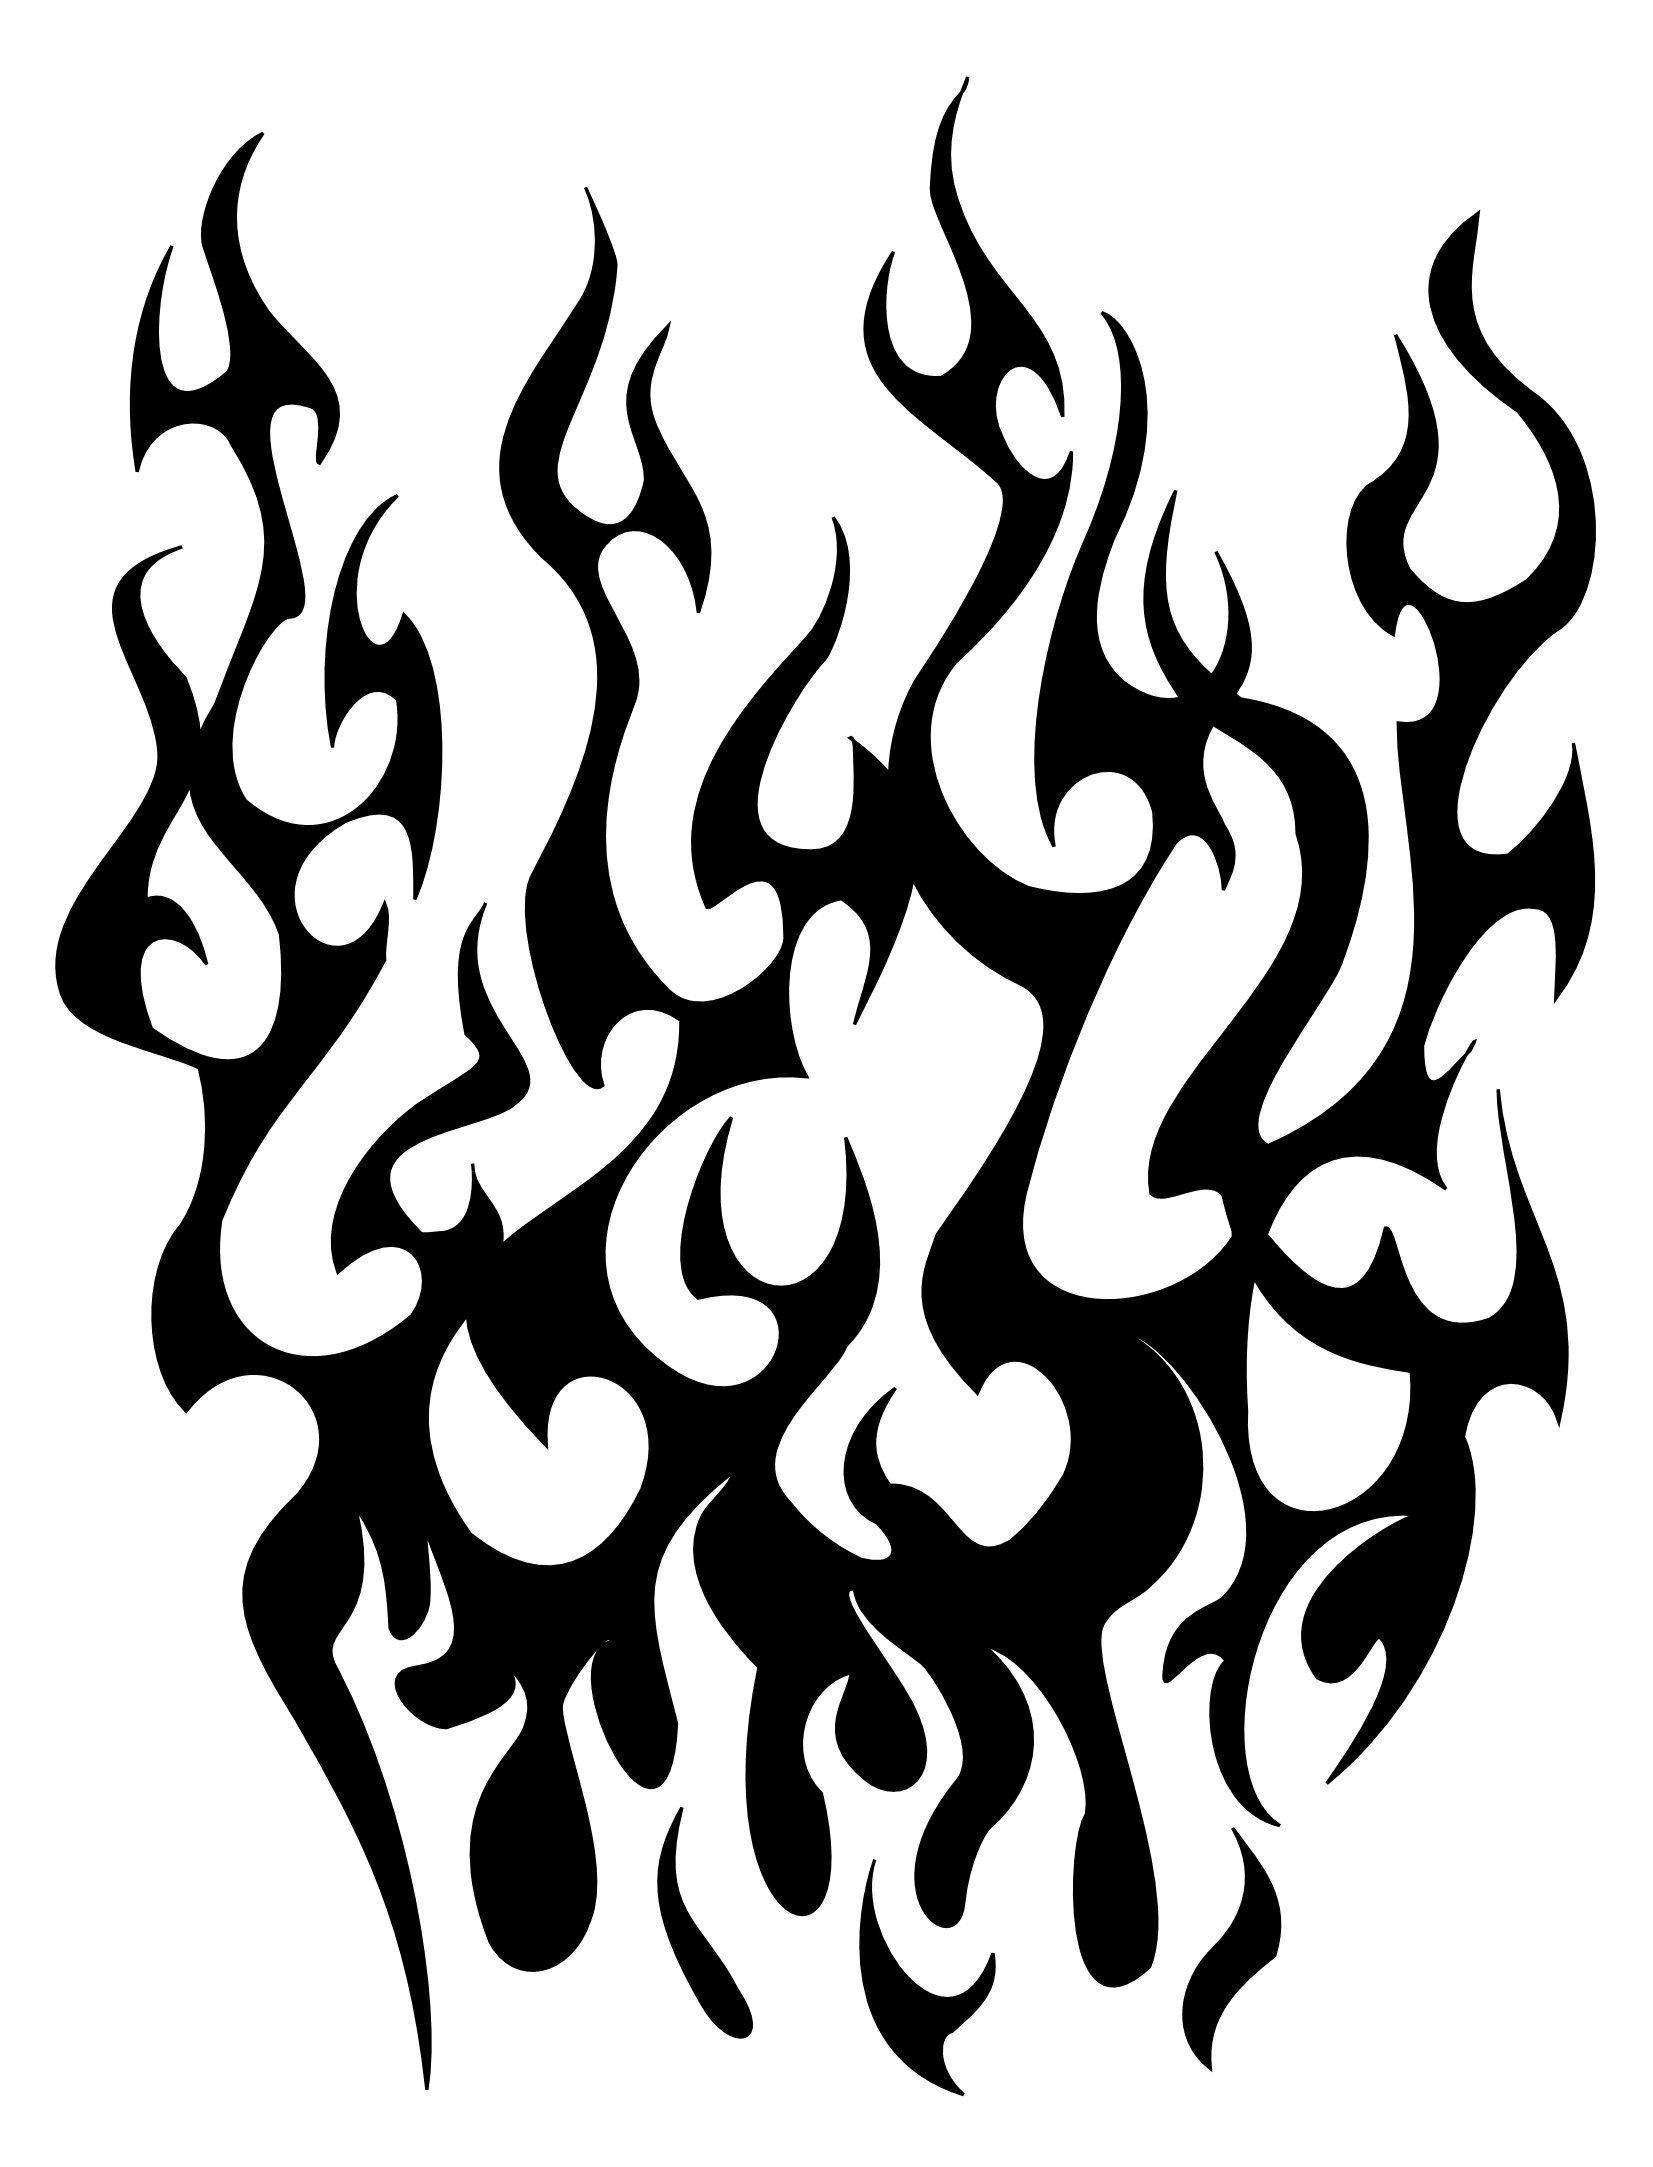 Tribal-Tattoos di7eMo47T